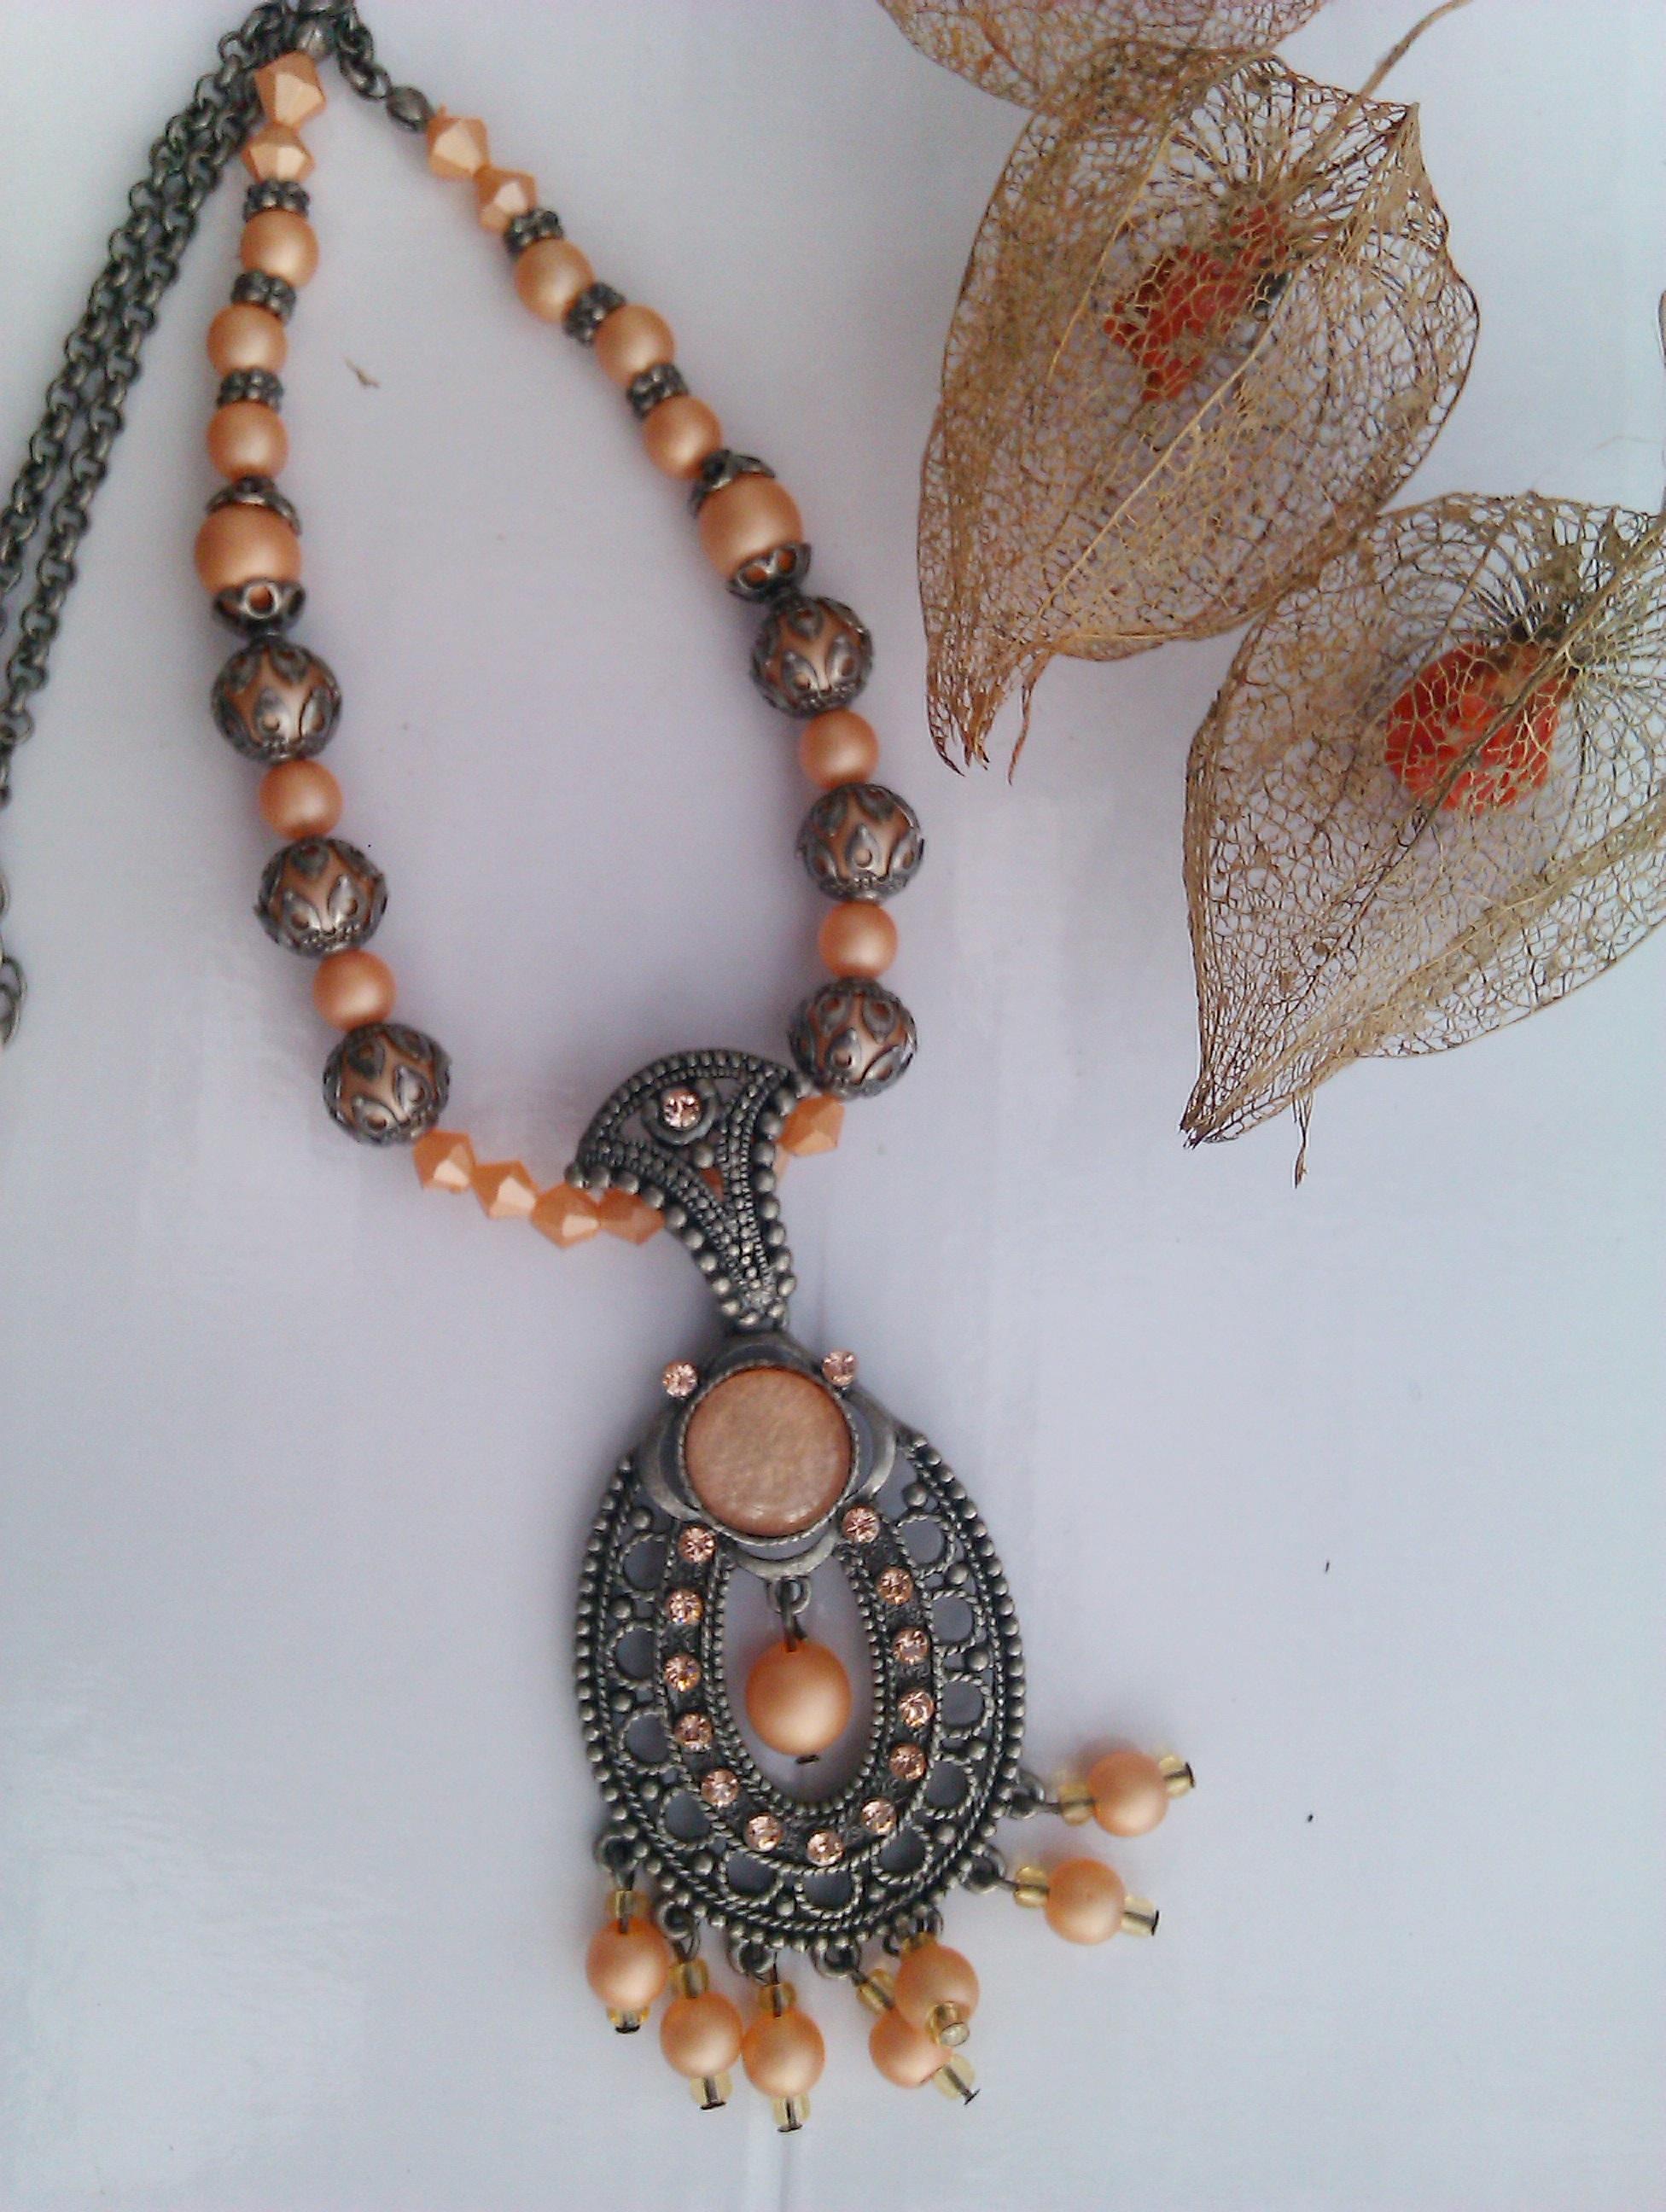 Peach ornate pendant